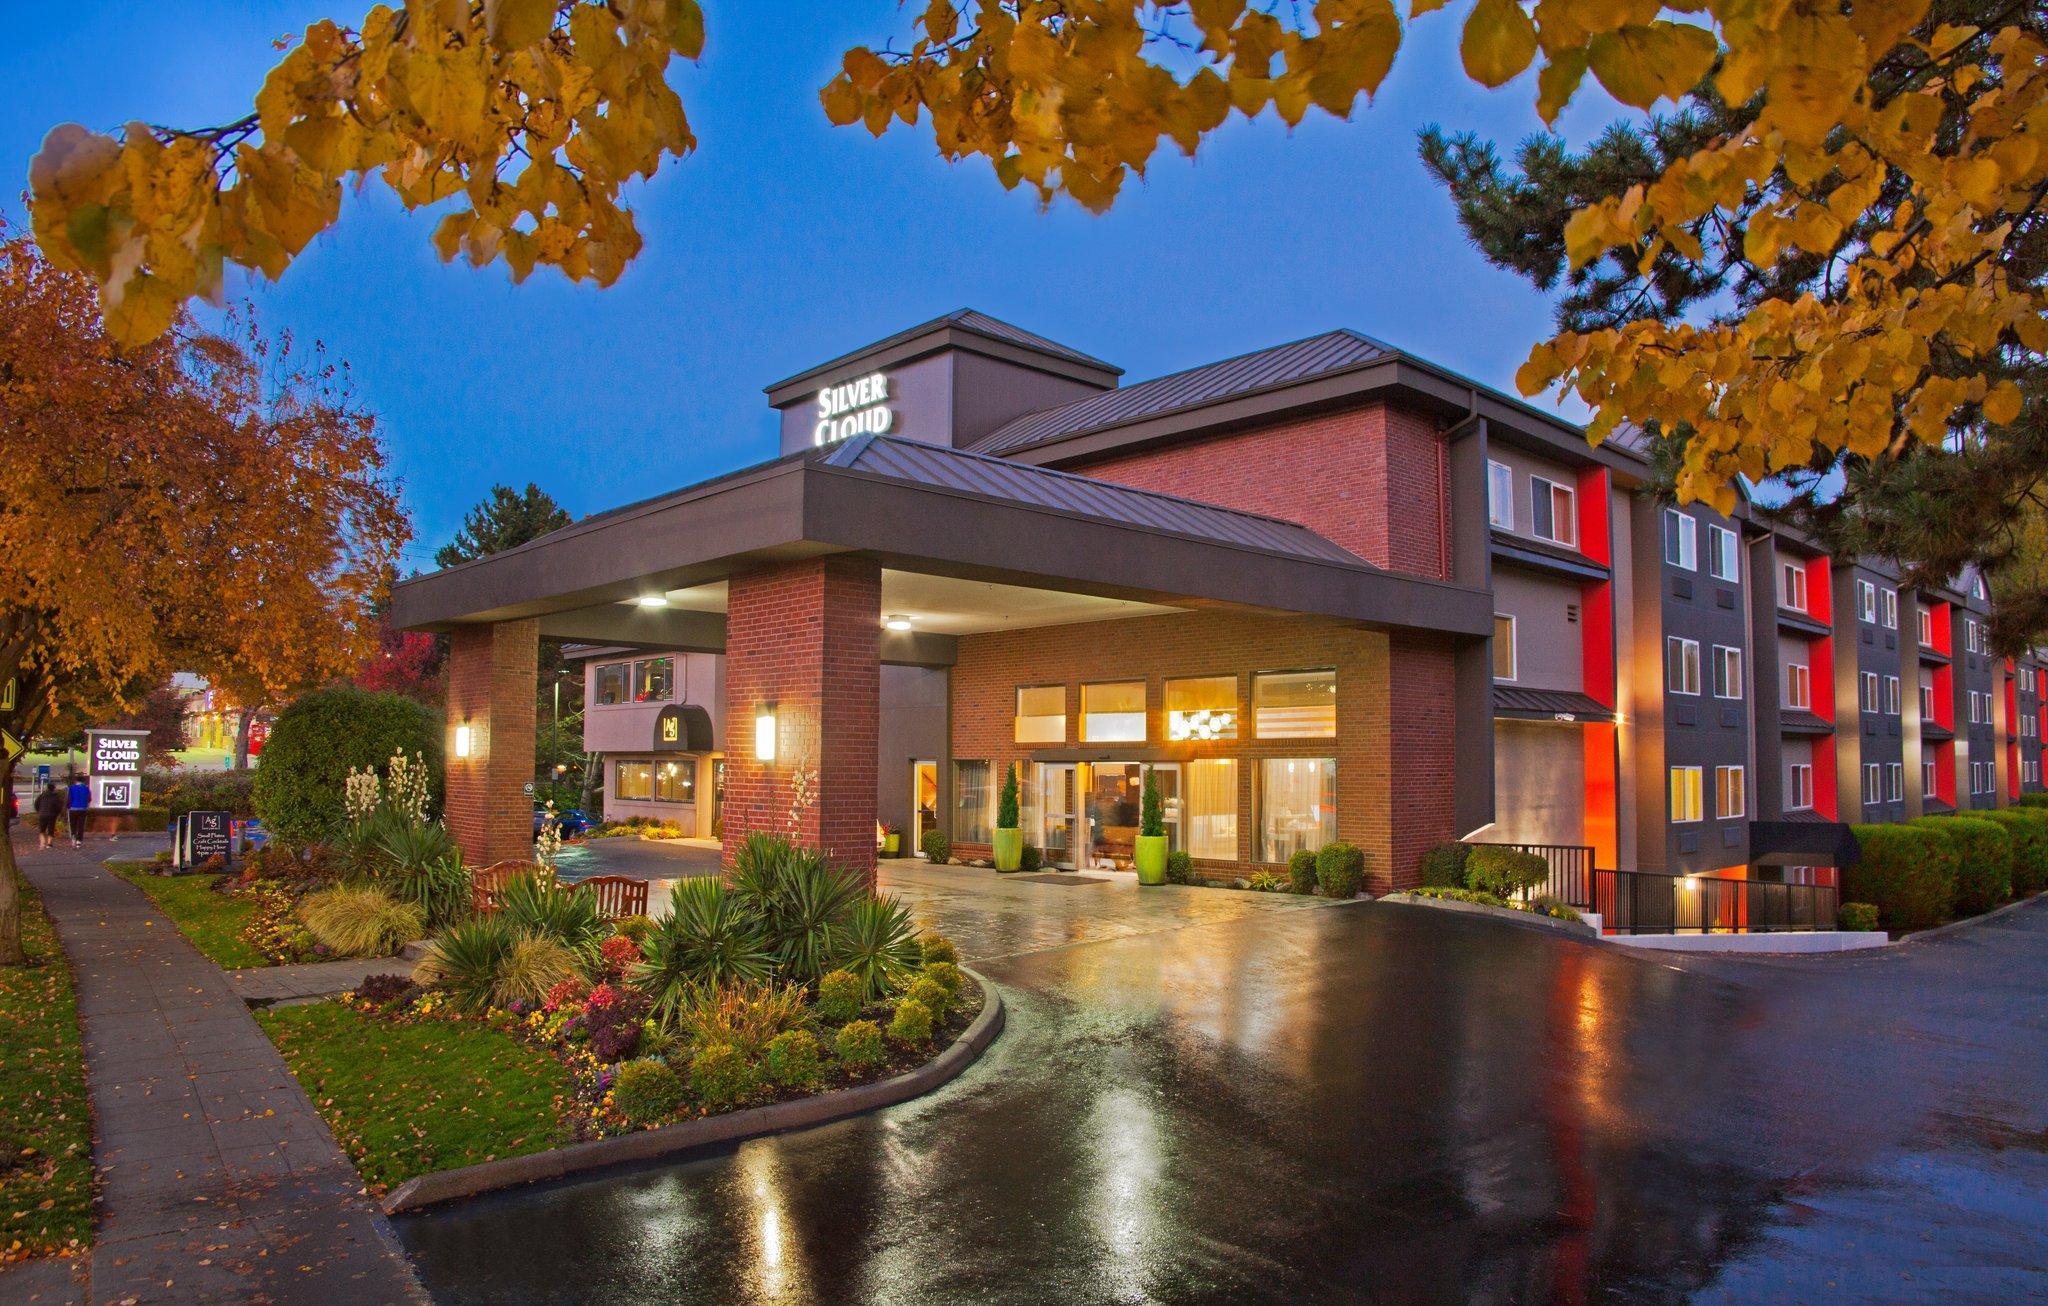 Silver Cloud Hotel   Seattle University Of Washington District